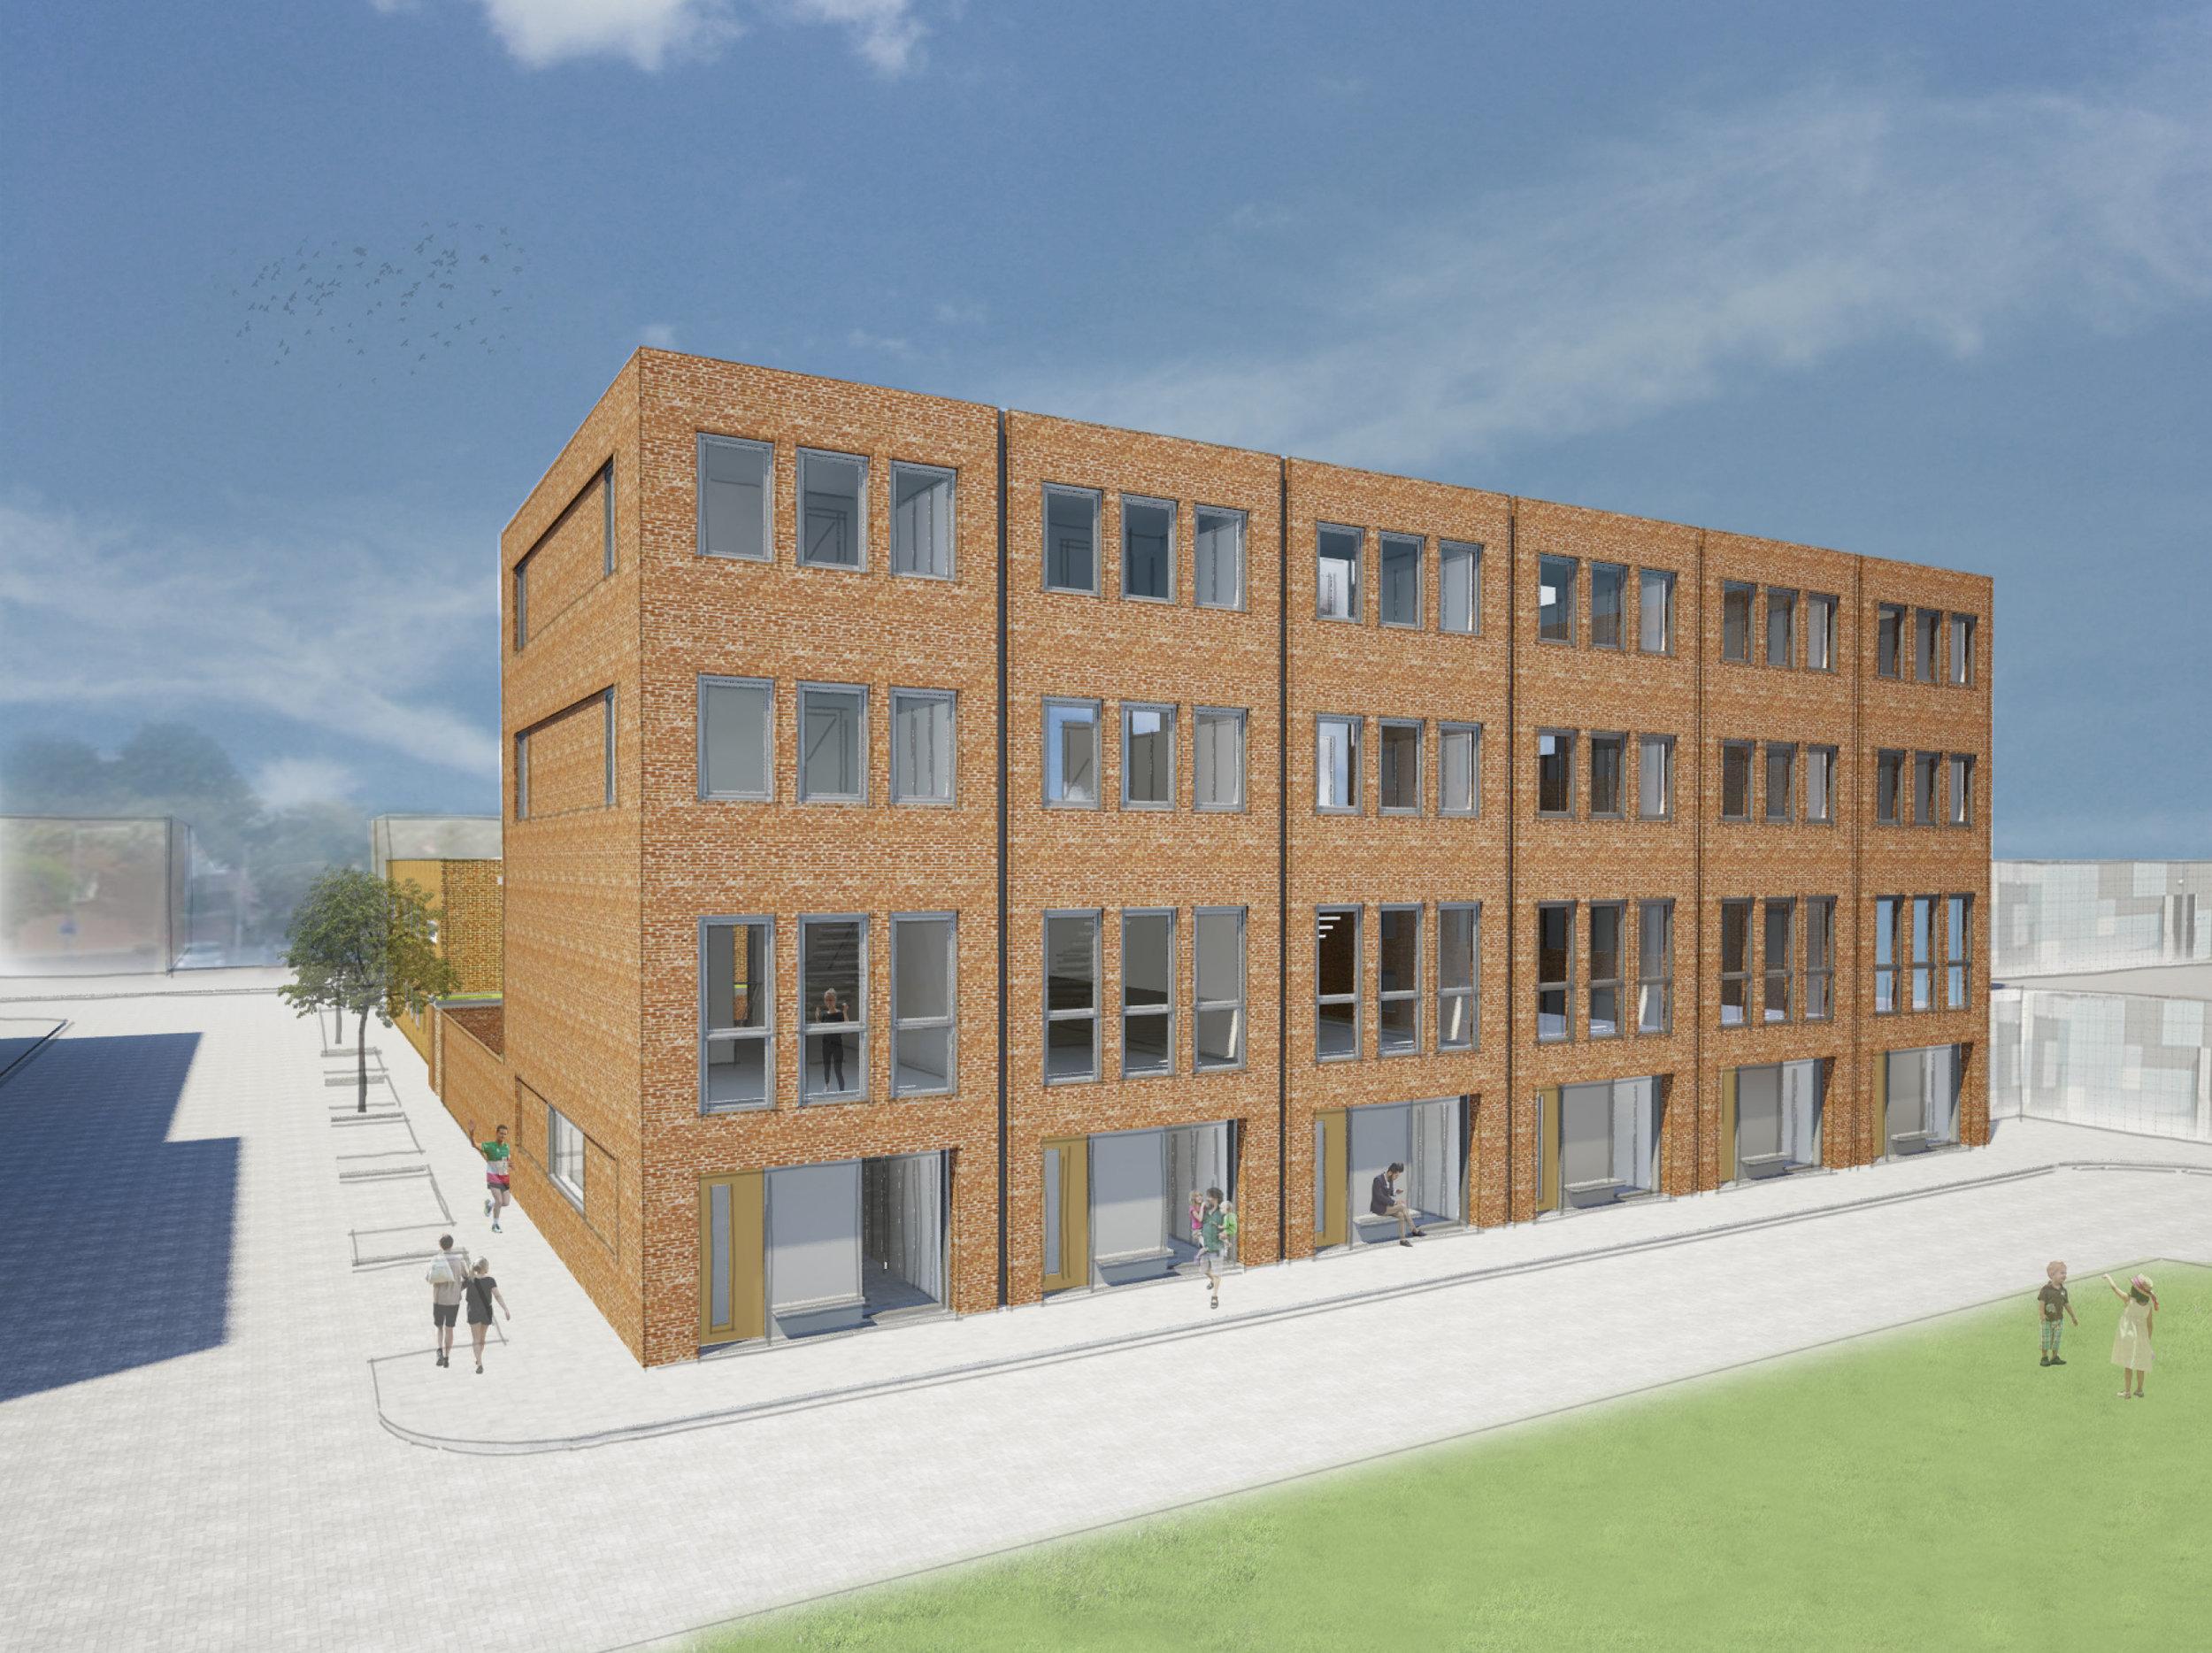 Personal-Architecture-rotterdam-m-straat-1.jpg